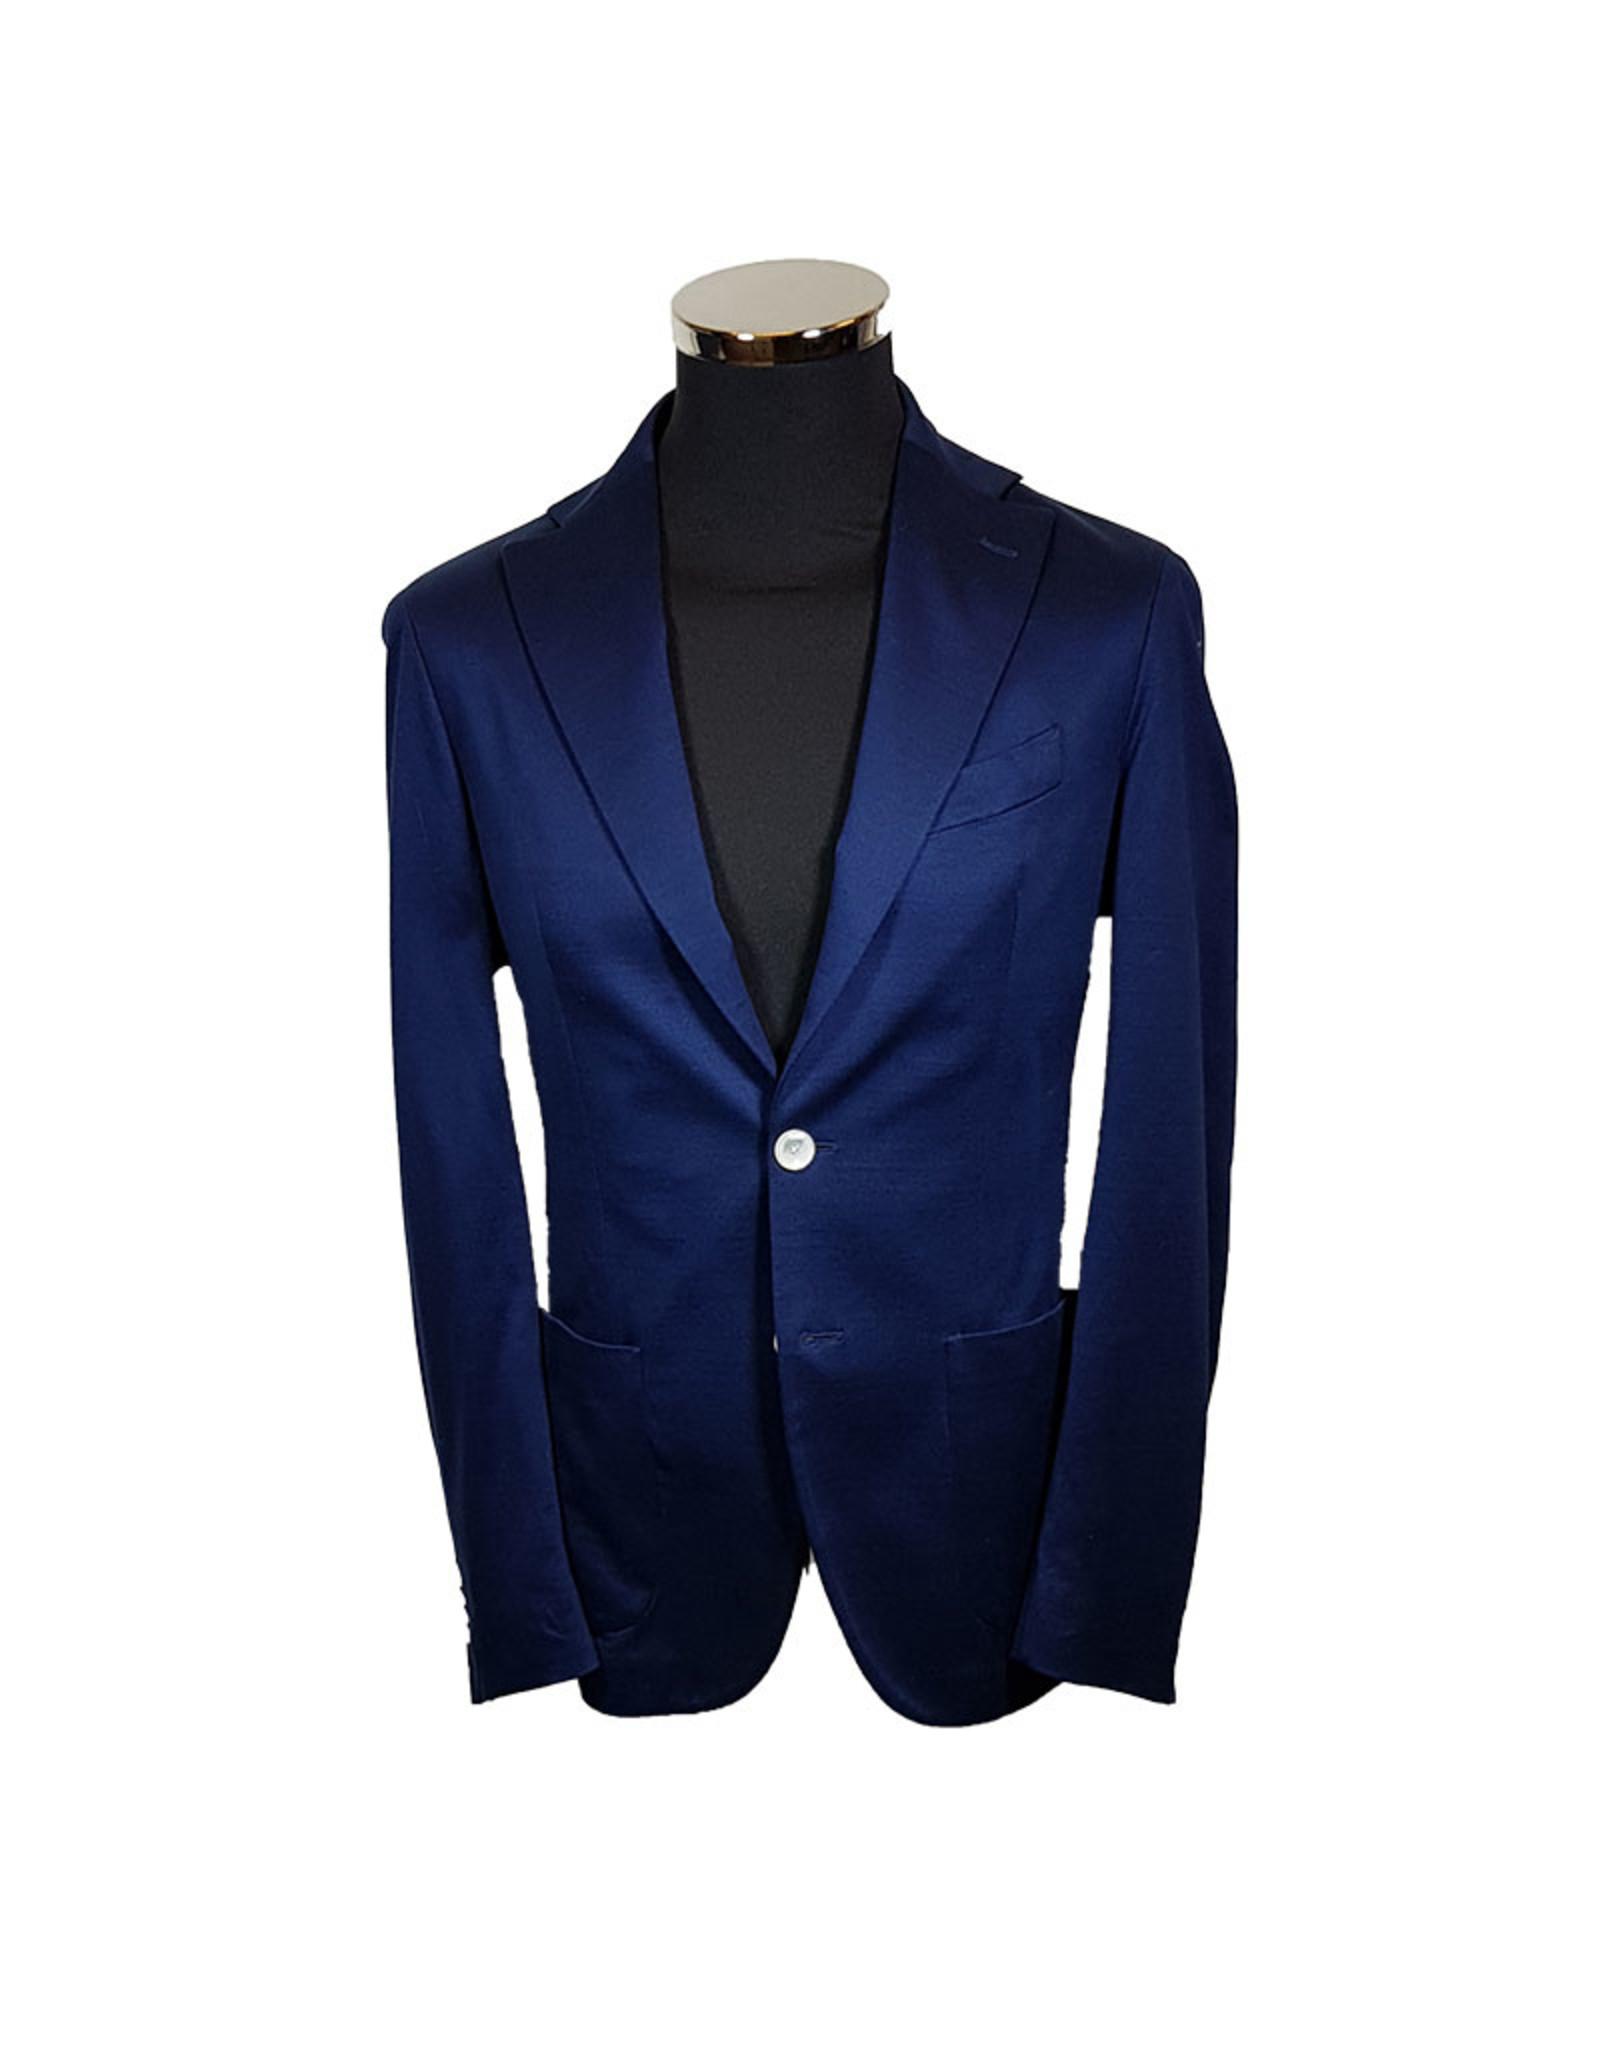 Latorre Gabiati vest blauw JE1132/1 Ponza